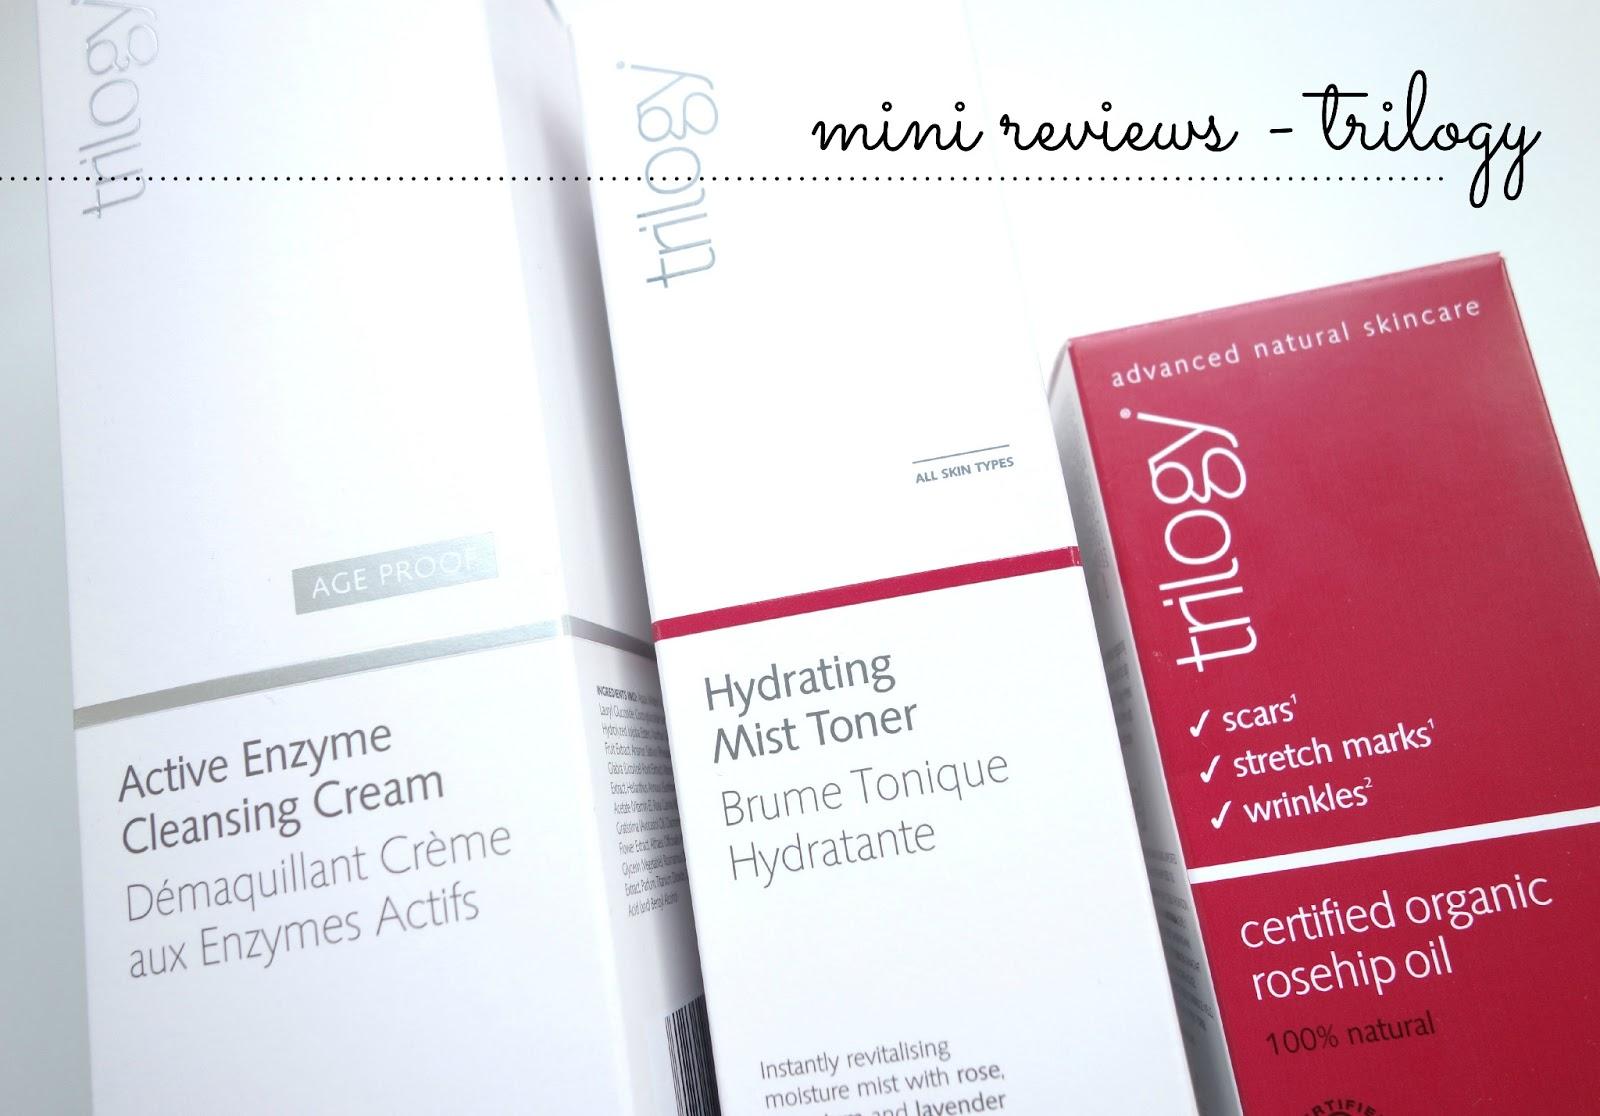 trilogy rosehip oil, trilogy active enzyme cleanser, trilogy hydrating mist toner